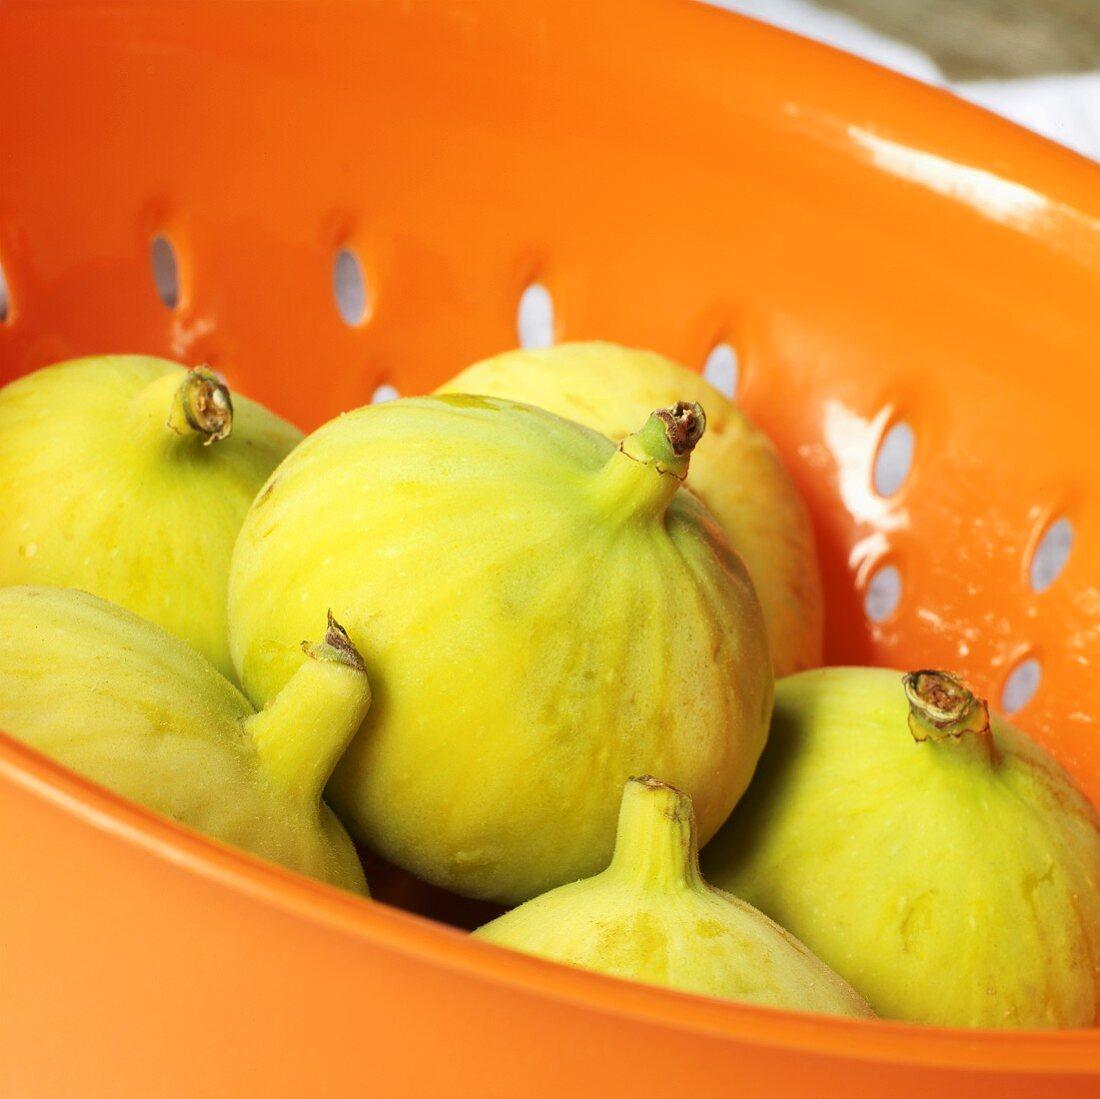 Calimyrna Figs in a Colander